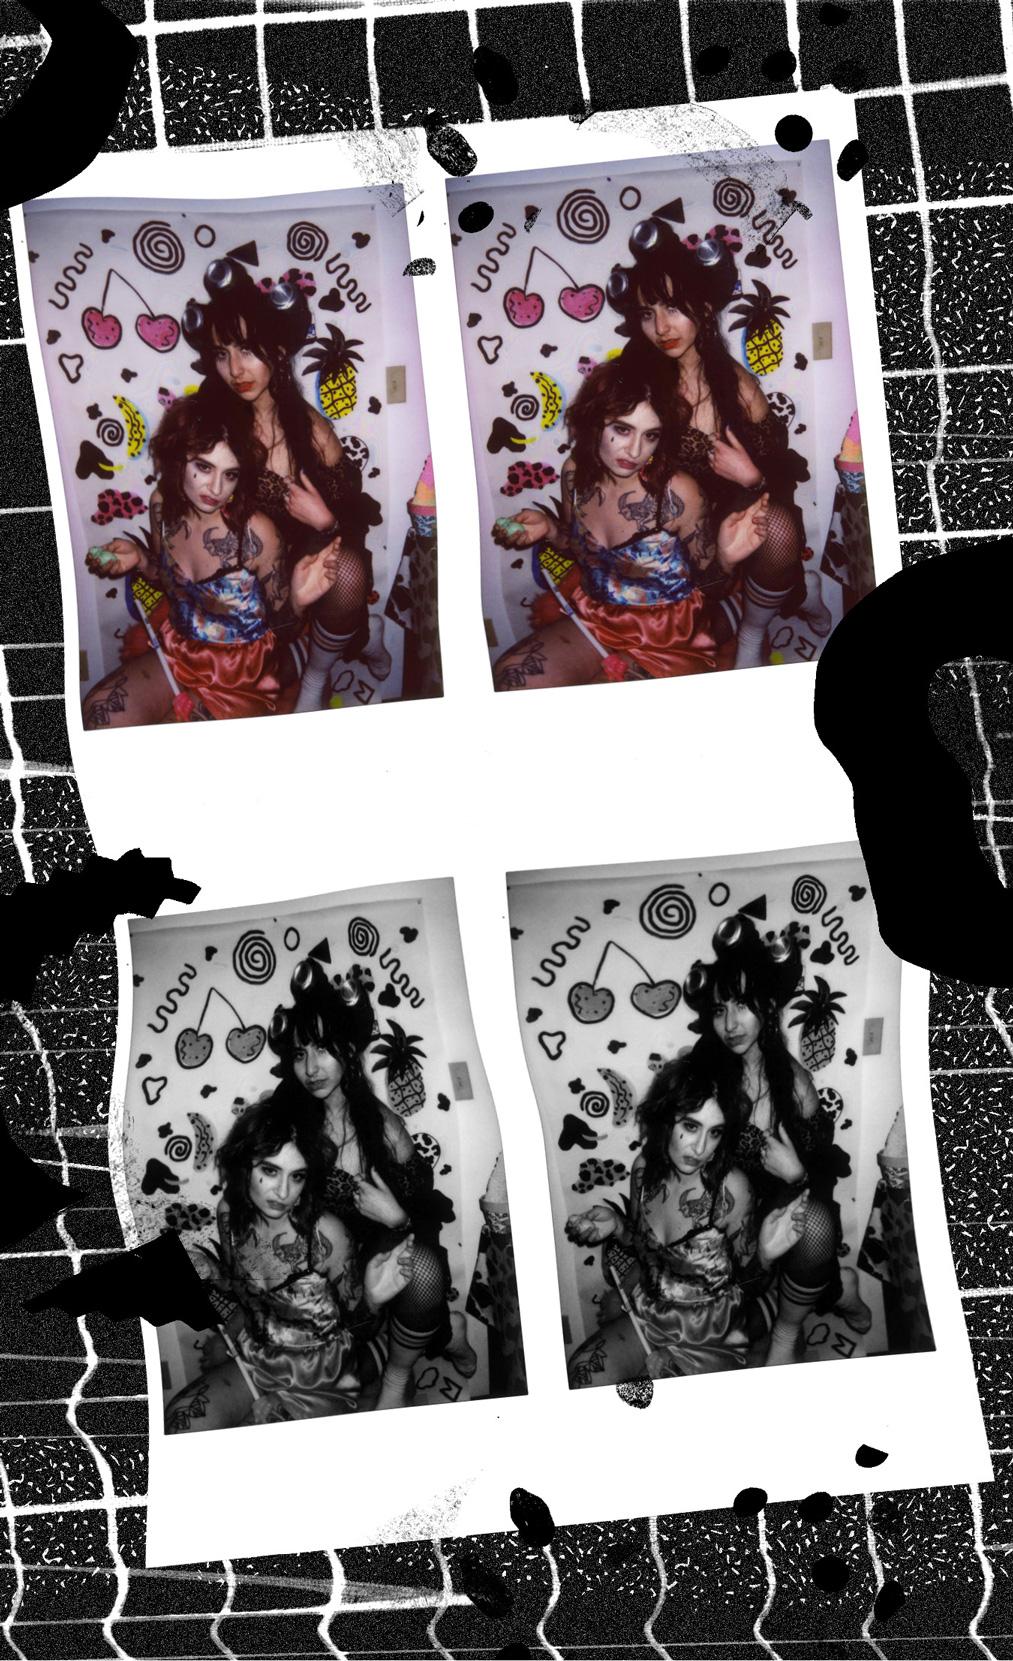 web_photo_04.jpg